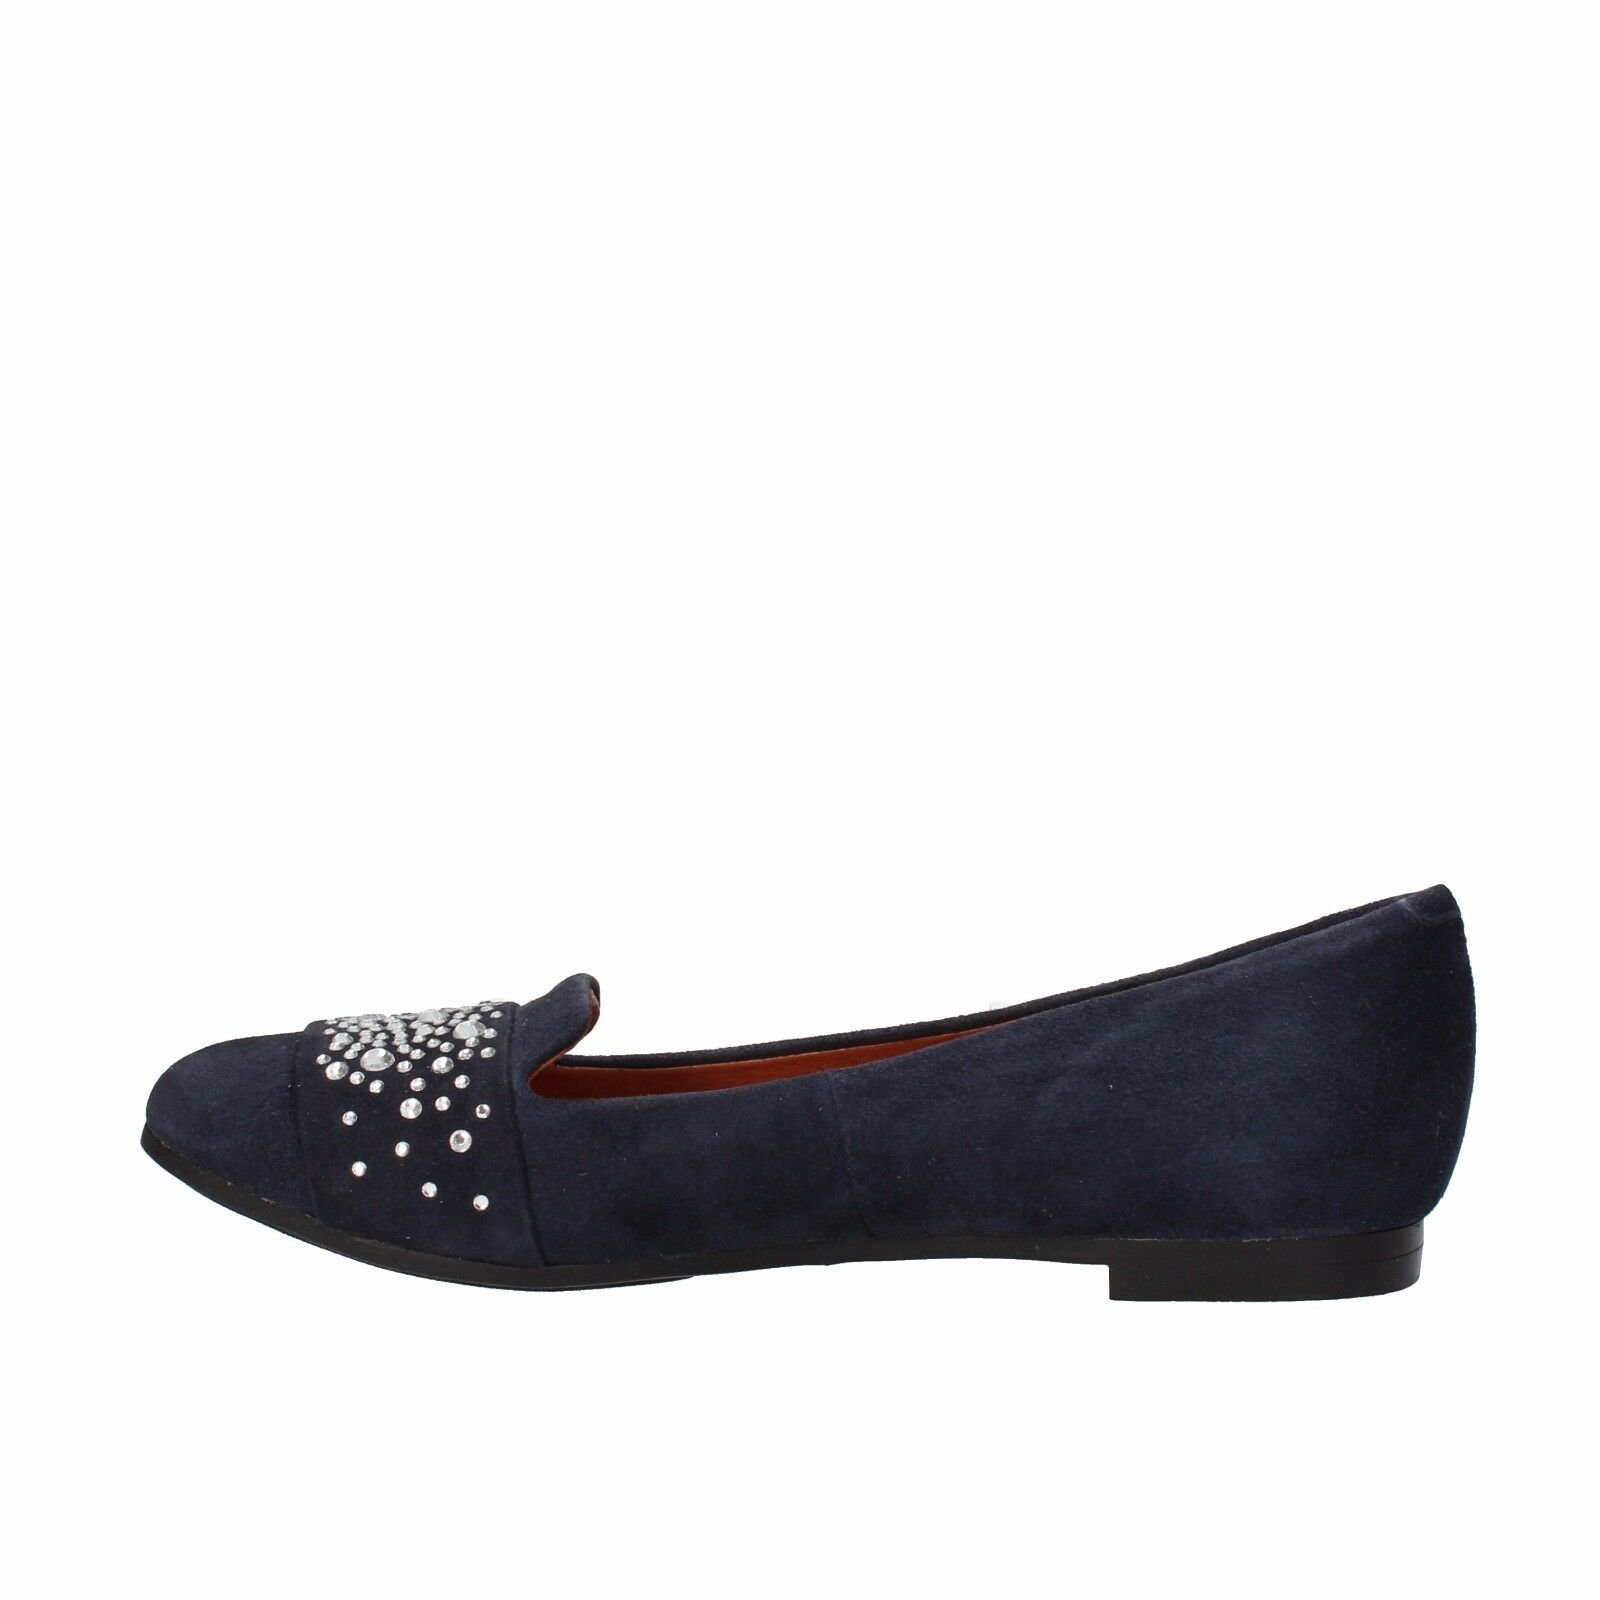 scarpe donna CARMENS 35 camoscio EU mocassini blu camoscio 35 AF38-B 33c417